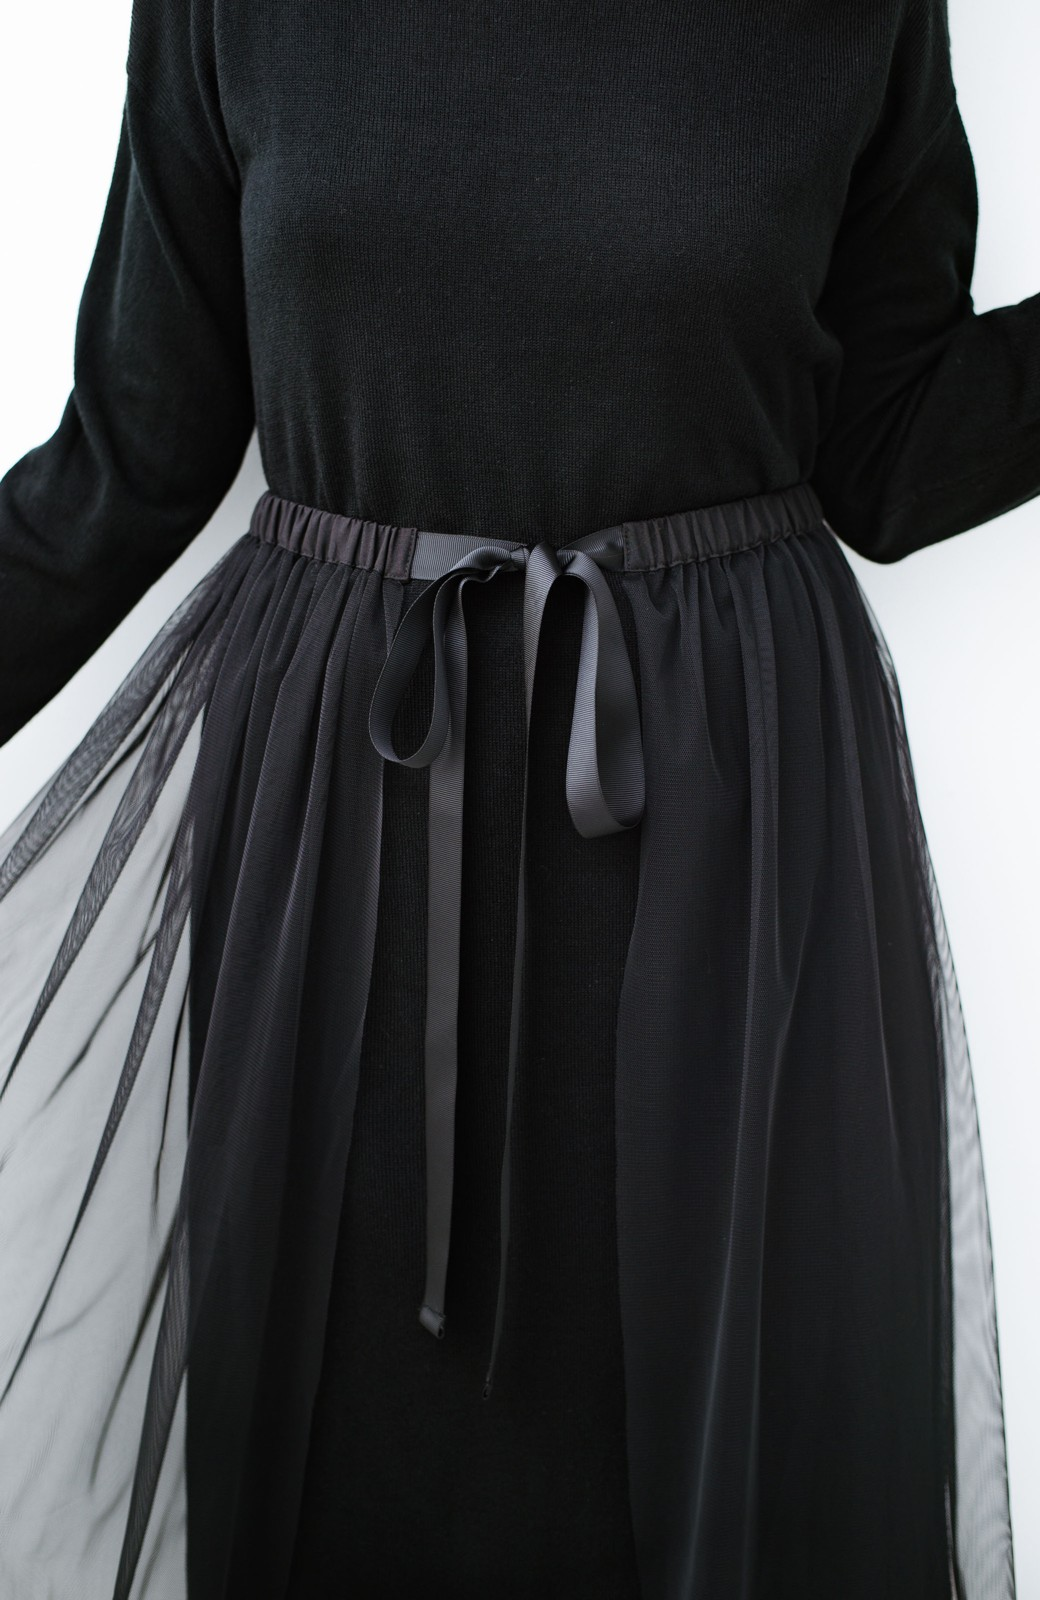 haco! 着こなし無限!自由自在なスリットロングニットとチェックプリーツスカートとチュール巻きスカートの3点セット <ブラック>の商品写真12